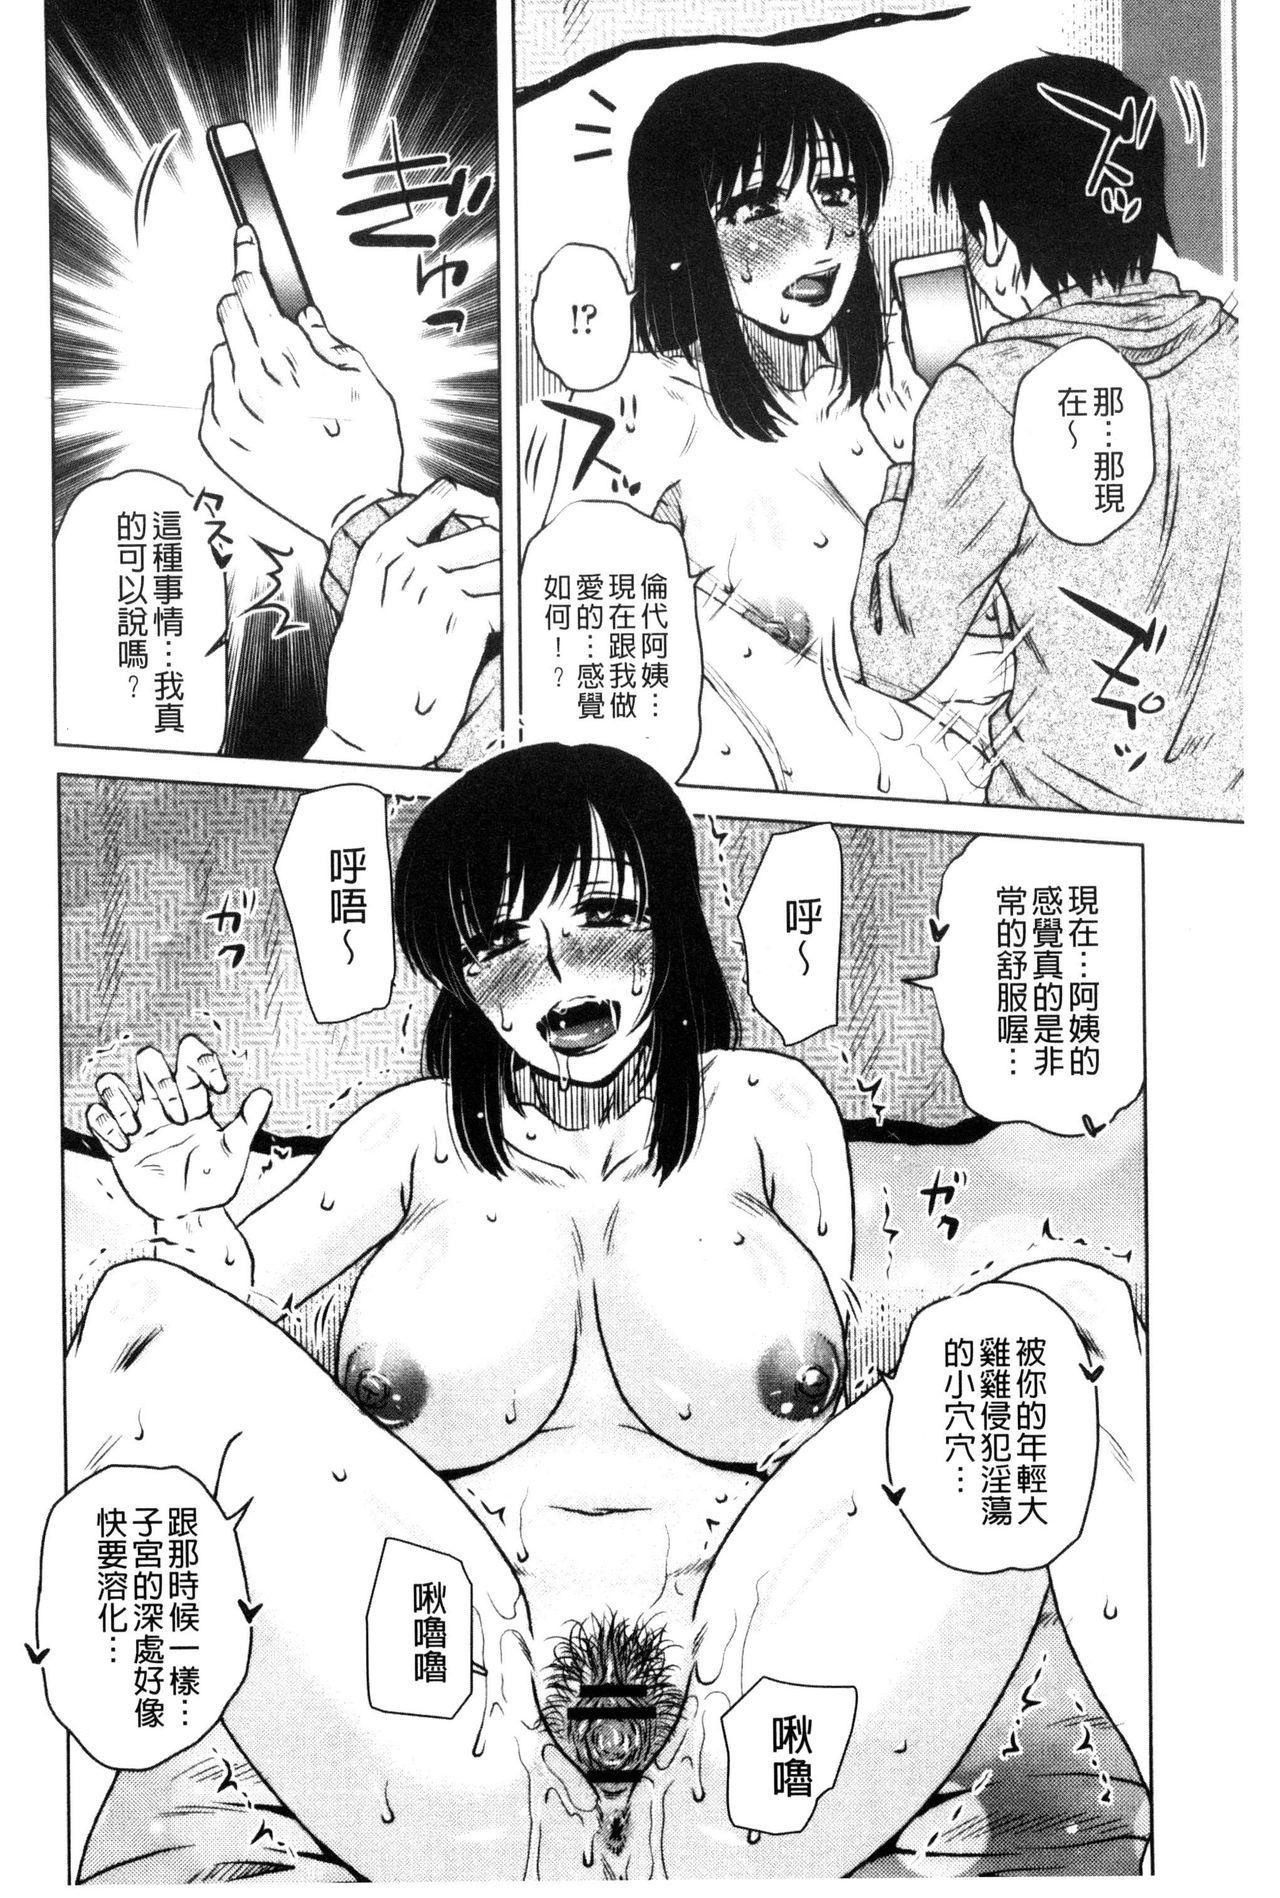 [Kurumiya Mashimin] Uchi no Shachou no Hamedere Inkatsu - Our President is HAME-DERE in Licentious sex life. [Chinese] 142